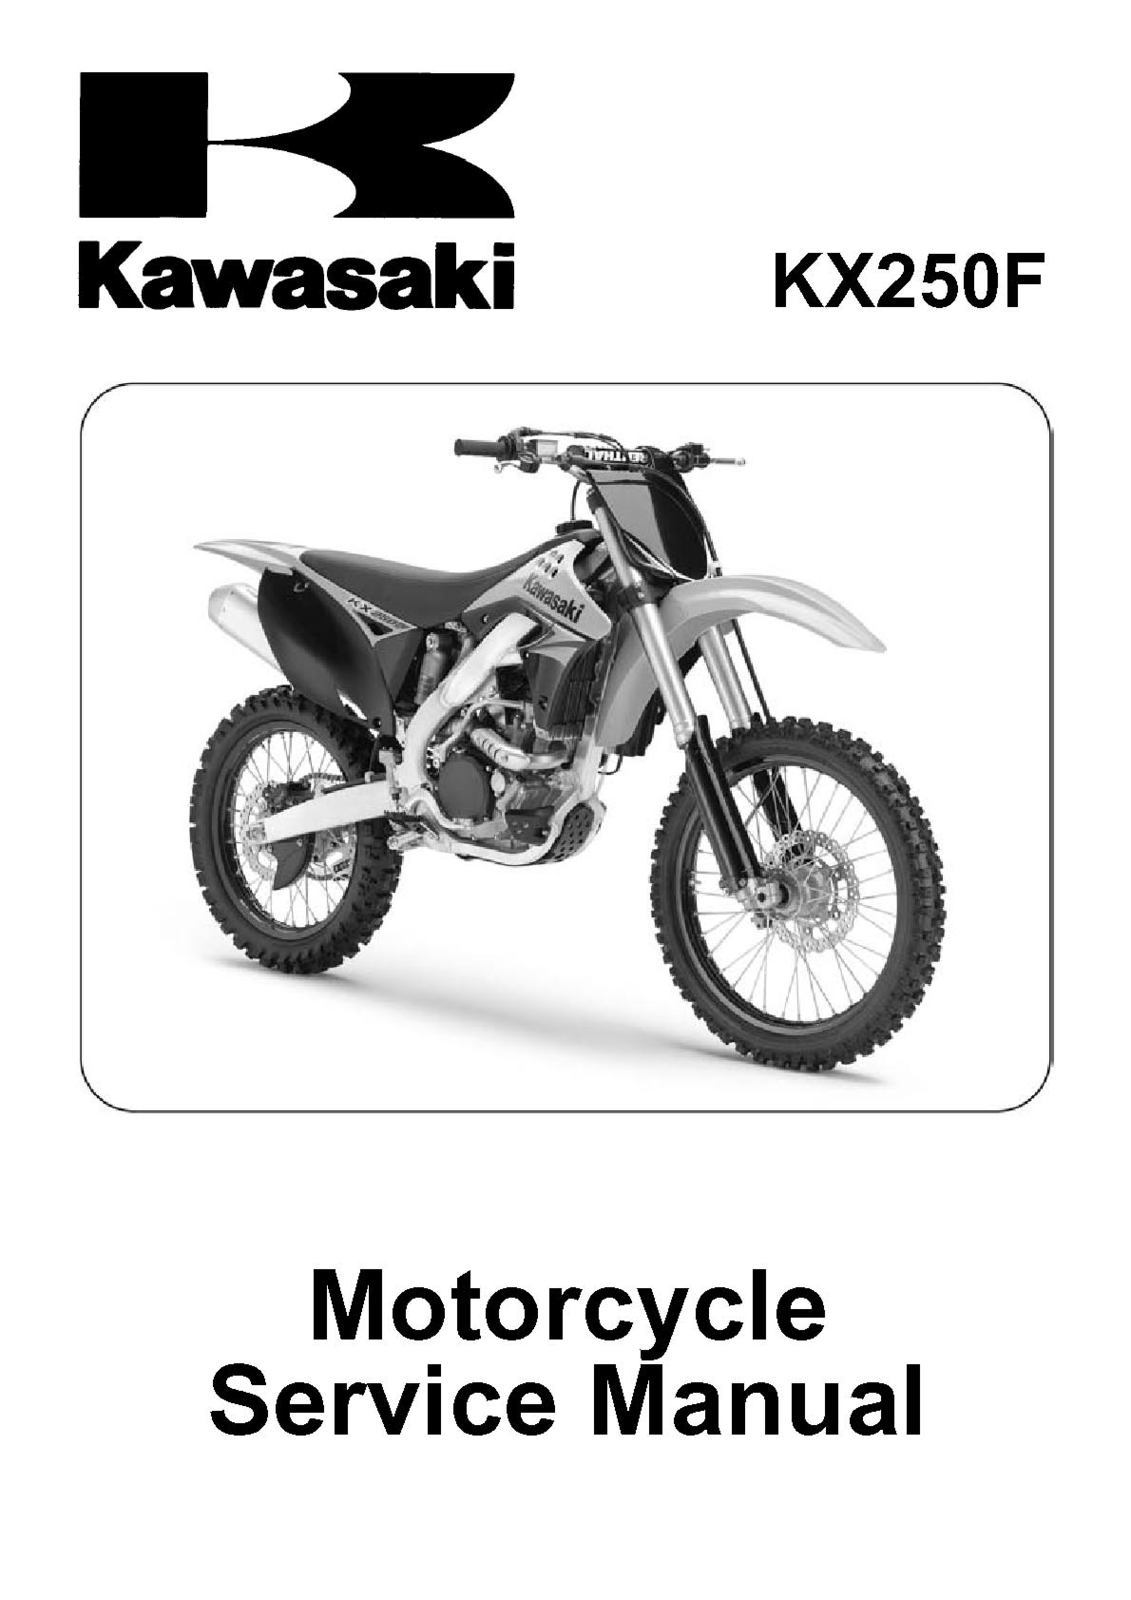 Kx250w9f 2009 kx250f. Kx250w9f 2009 kx250f. Kawasaki KX250F KX 250F 250 F  KX250W9F Shop Service Repair Manual ...